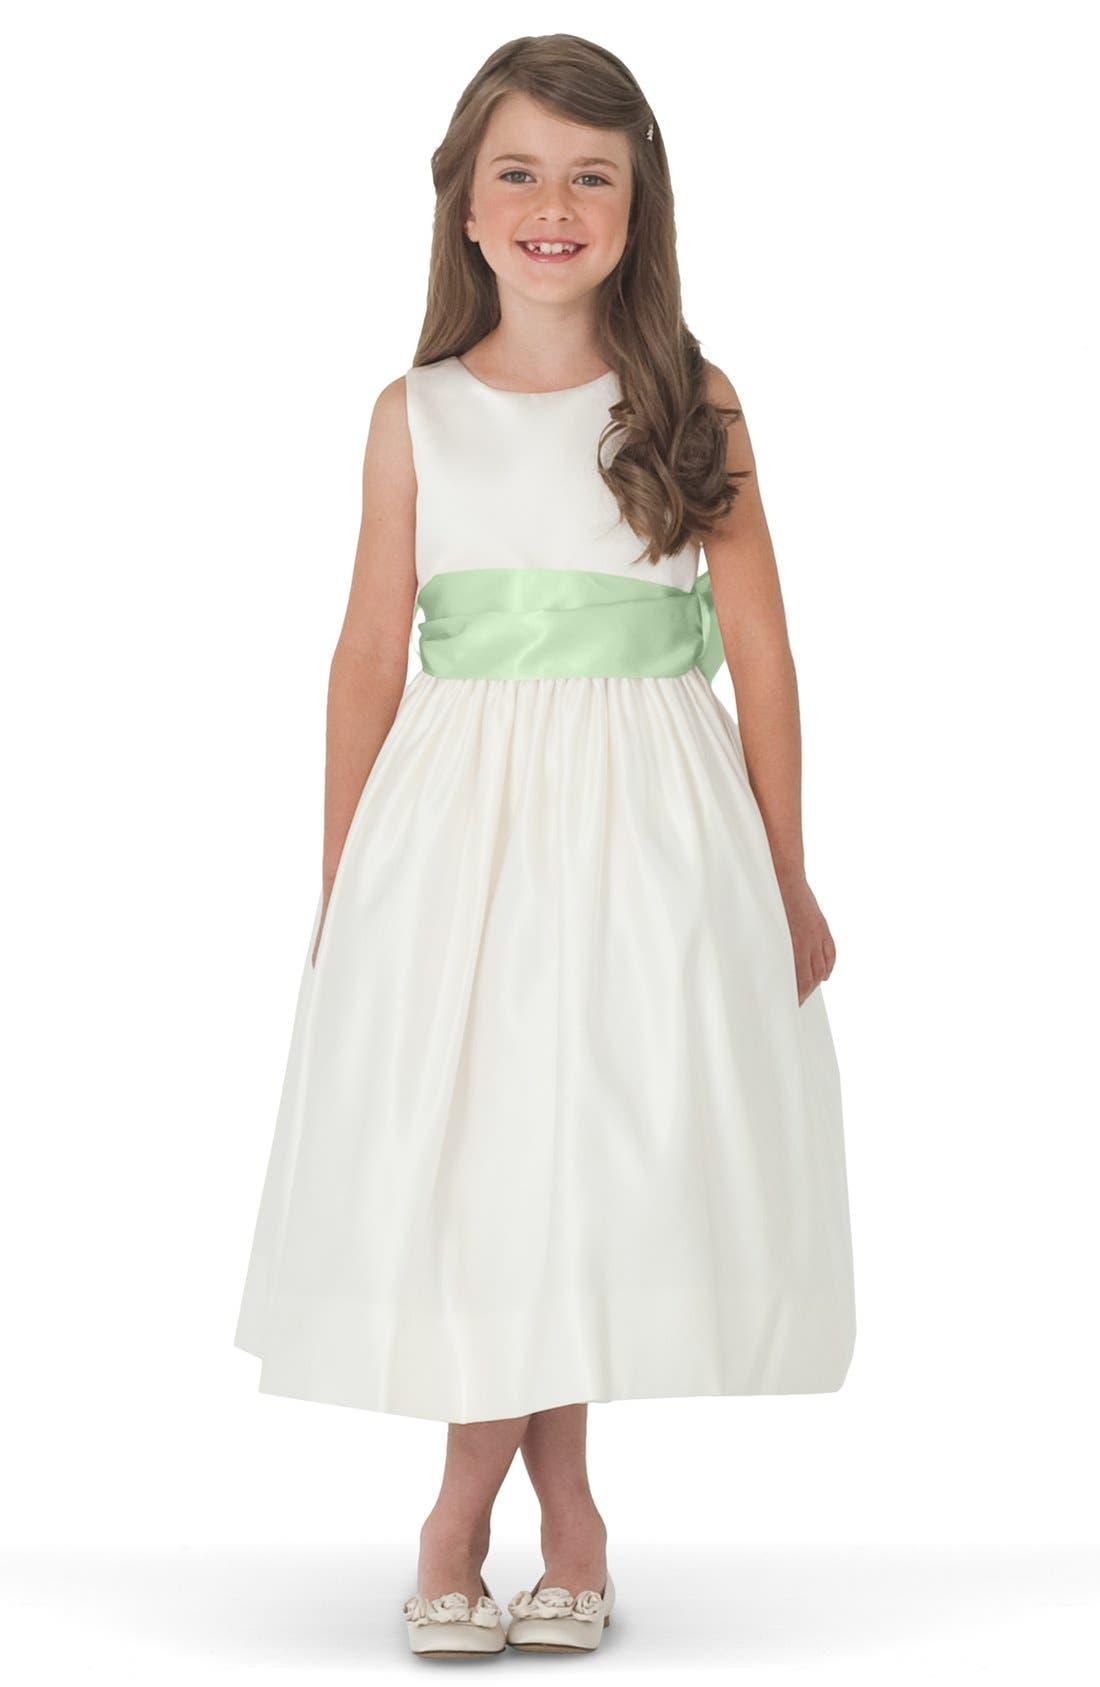 Alternate Image 1 Selected - Us Angels Sleeveless Satin Dress with Contrast Sash (Toddler Girls, Little Girls & Big Girls)